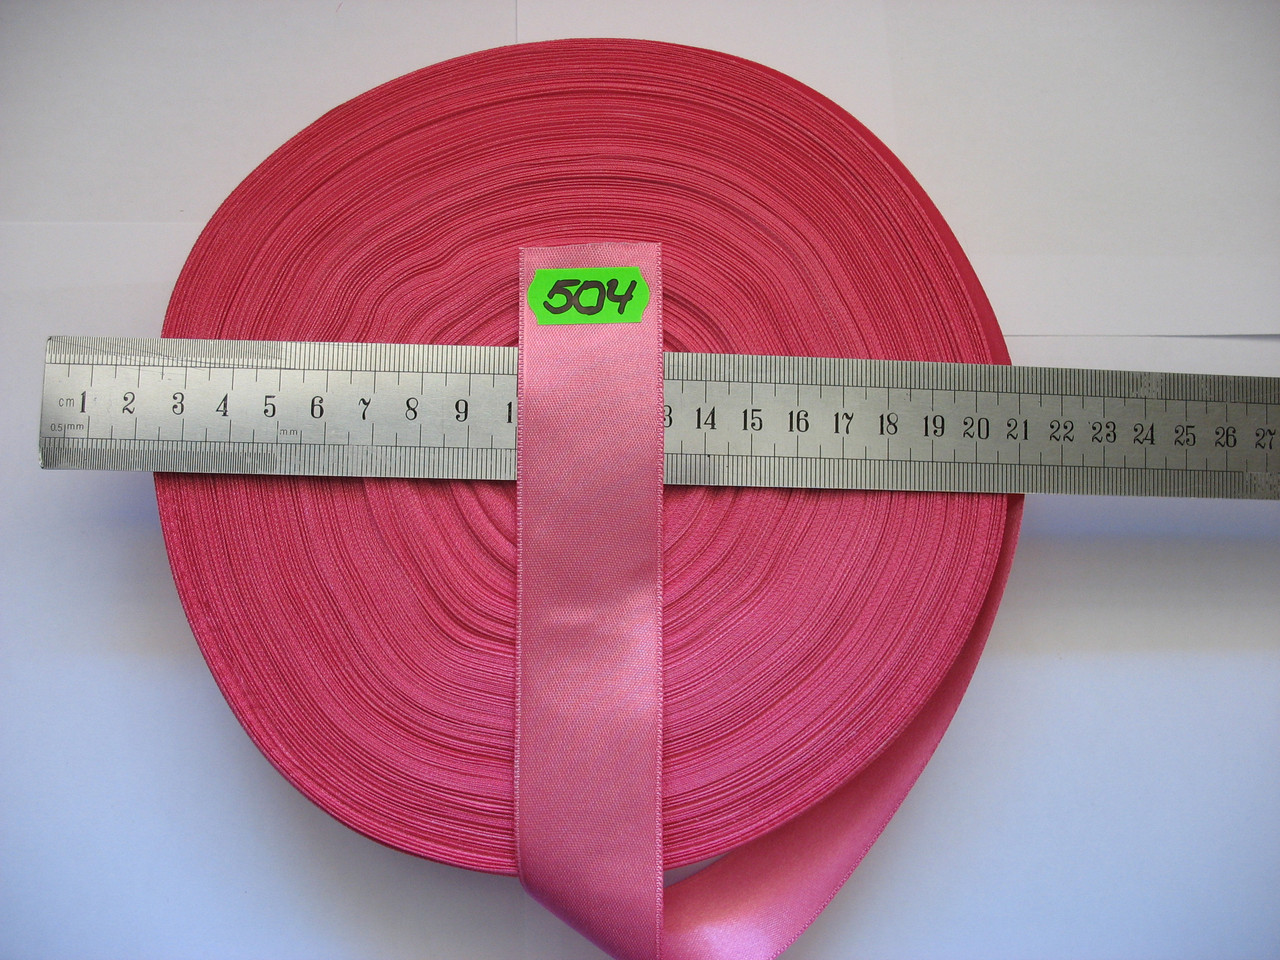 Лента атласная двухсторонняя 30мм, цвет темно-розовый, Турция